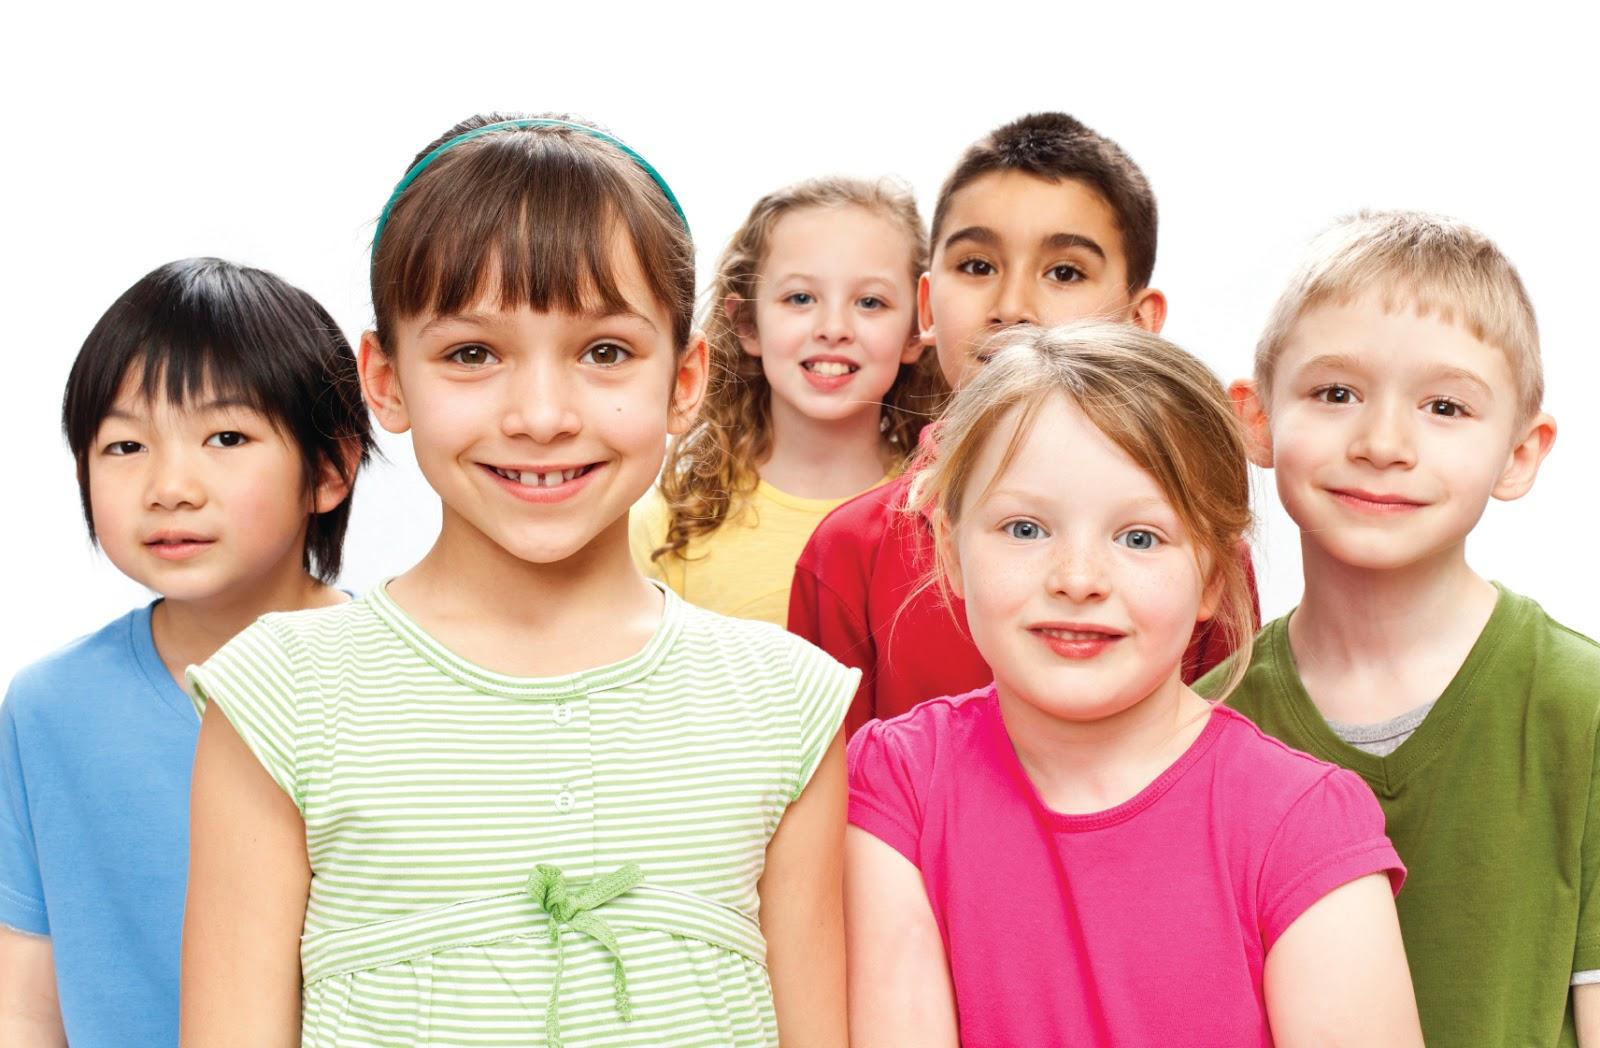 http://1.bp.blogspot.com/-XVZVWTEx2Ek/TtY_dN9OA_I/AAAAAAAAADo/s_HvM5eOEu8/s1600/kids%20in%20group.jpg